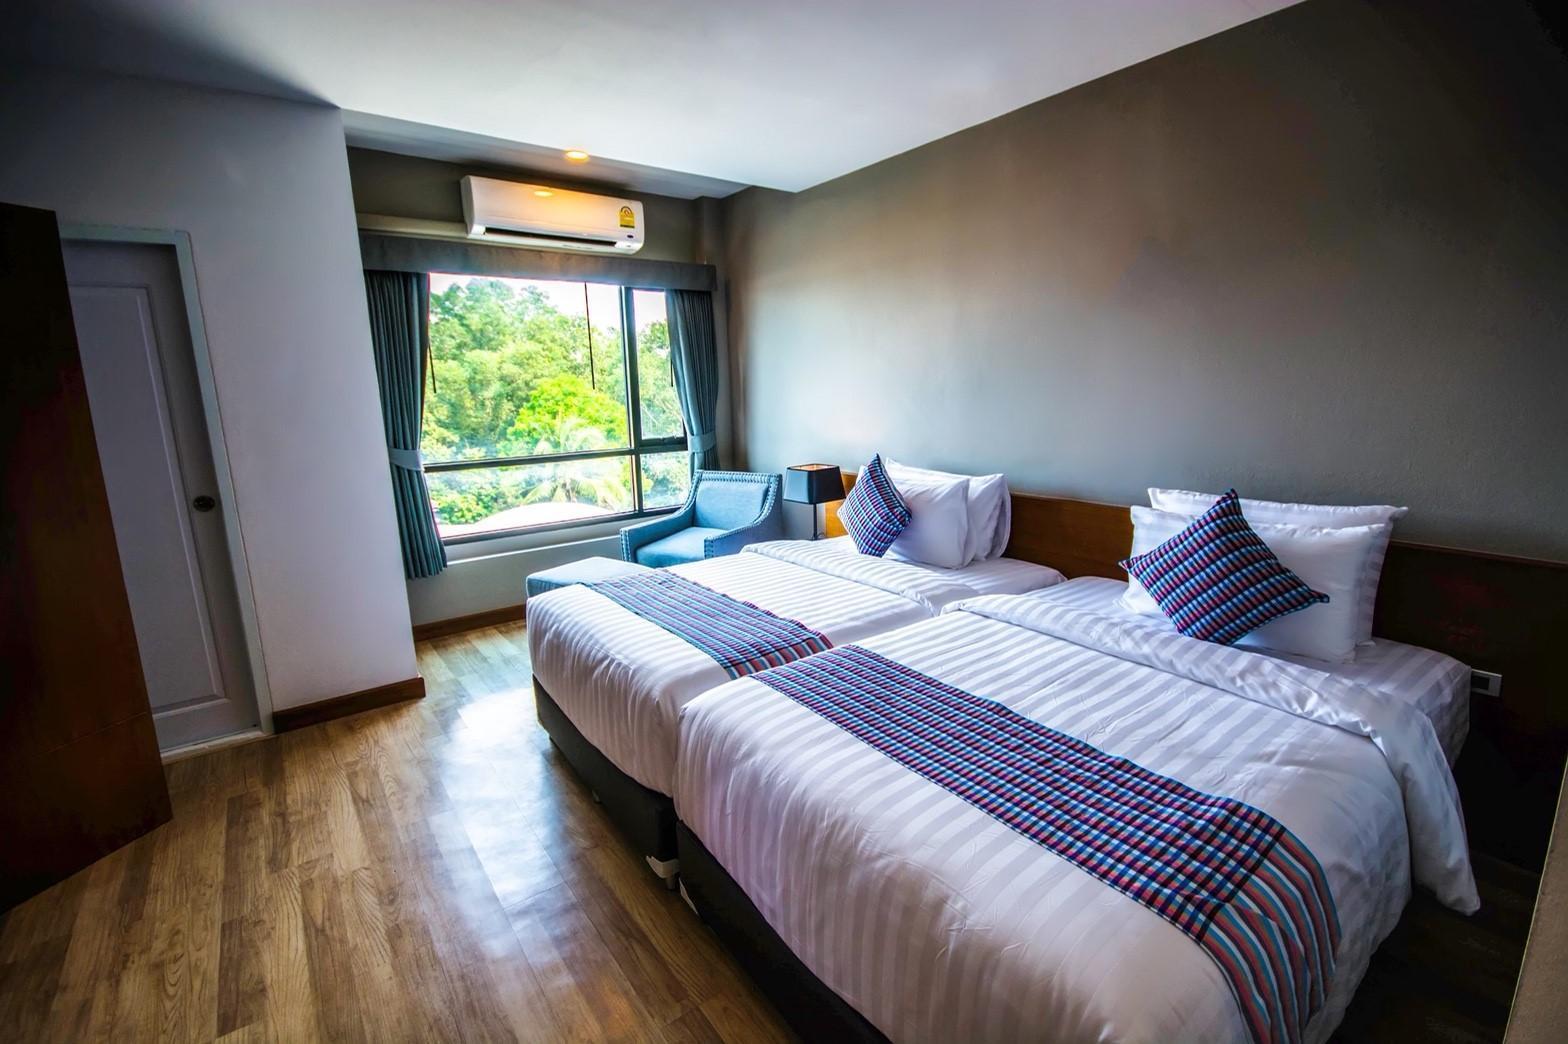 Comet Hotel Surat Thani Reviews